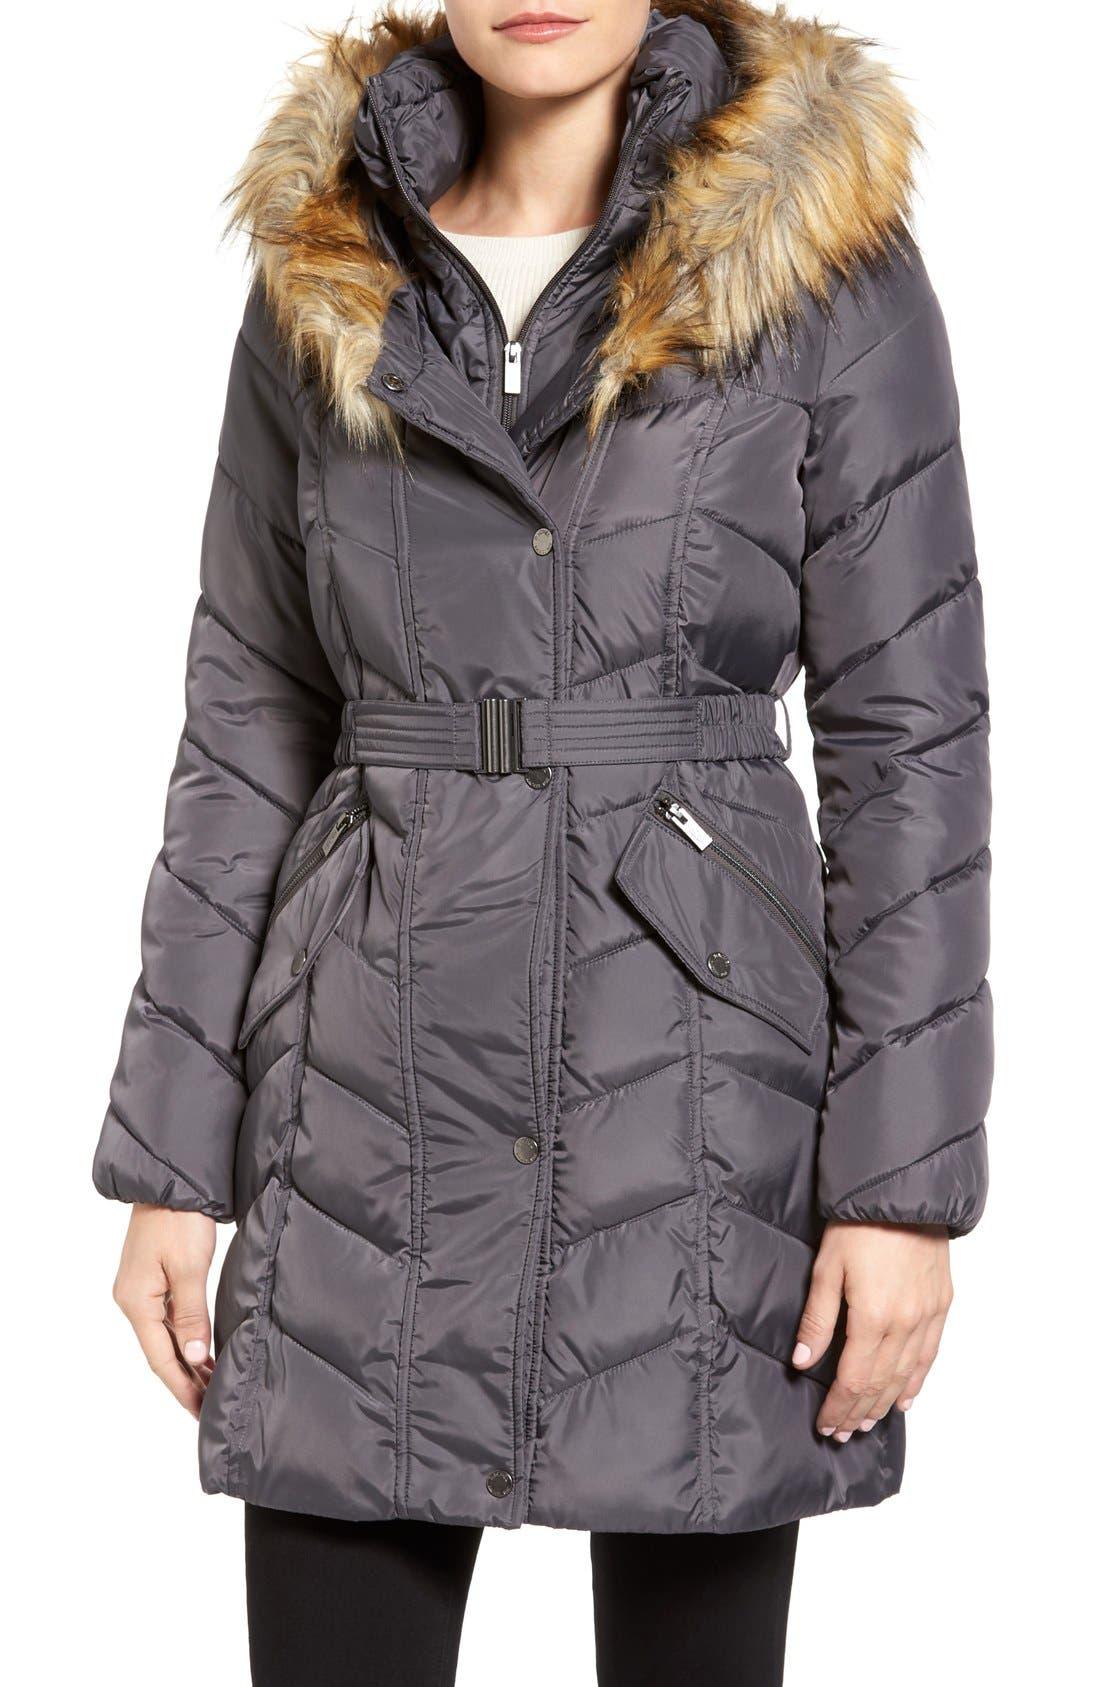 Main Image - Rachel Roy Faux Fur Trim Quilted Coat with Bib